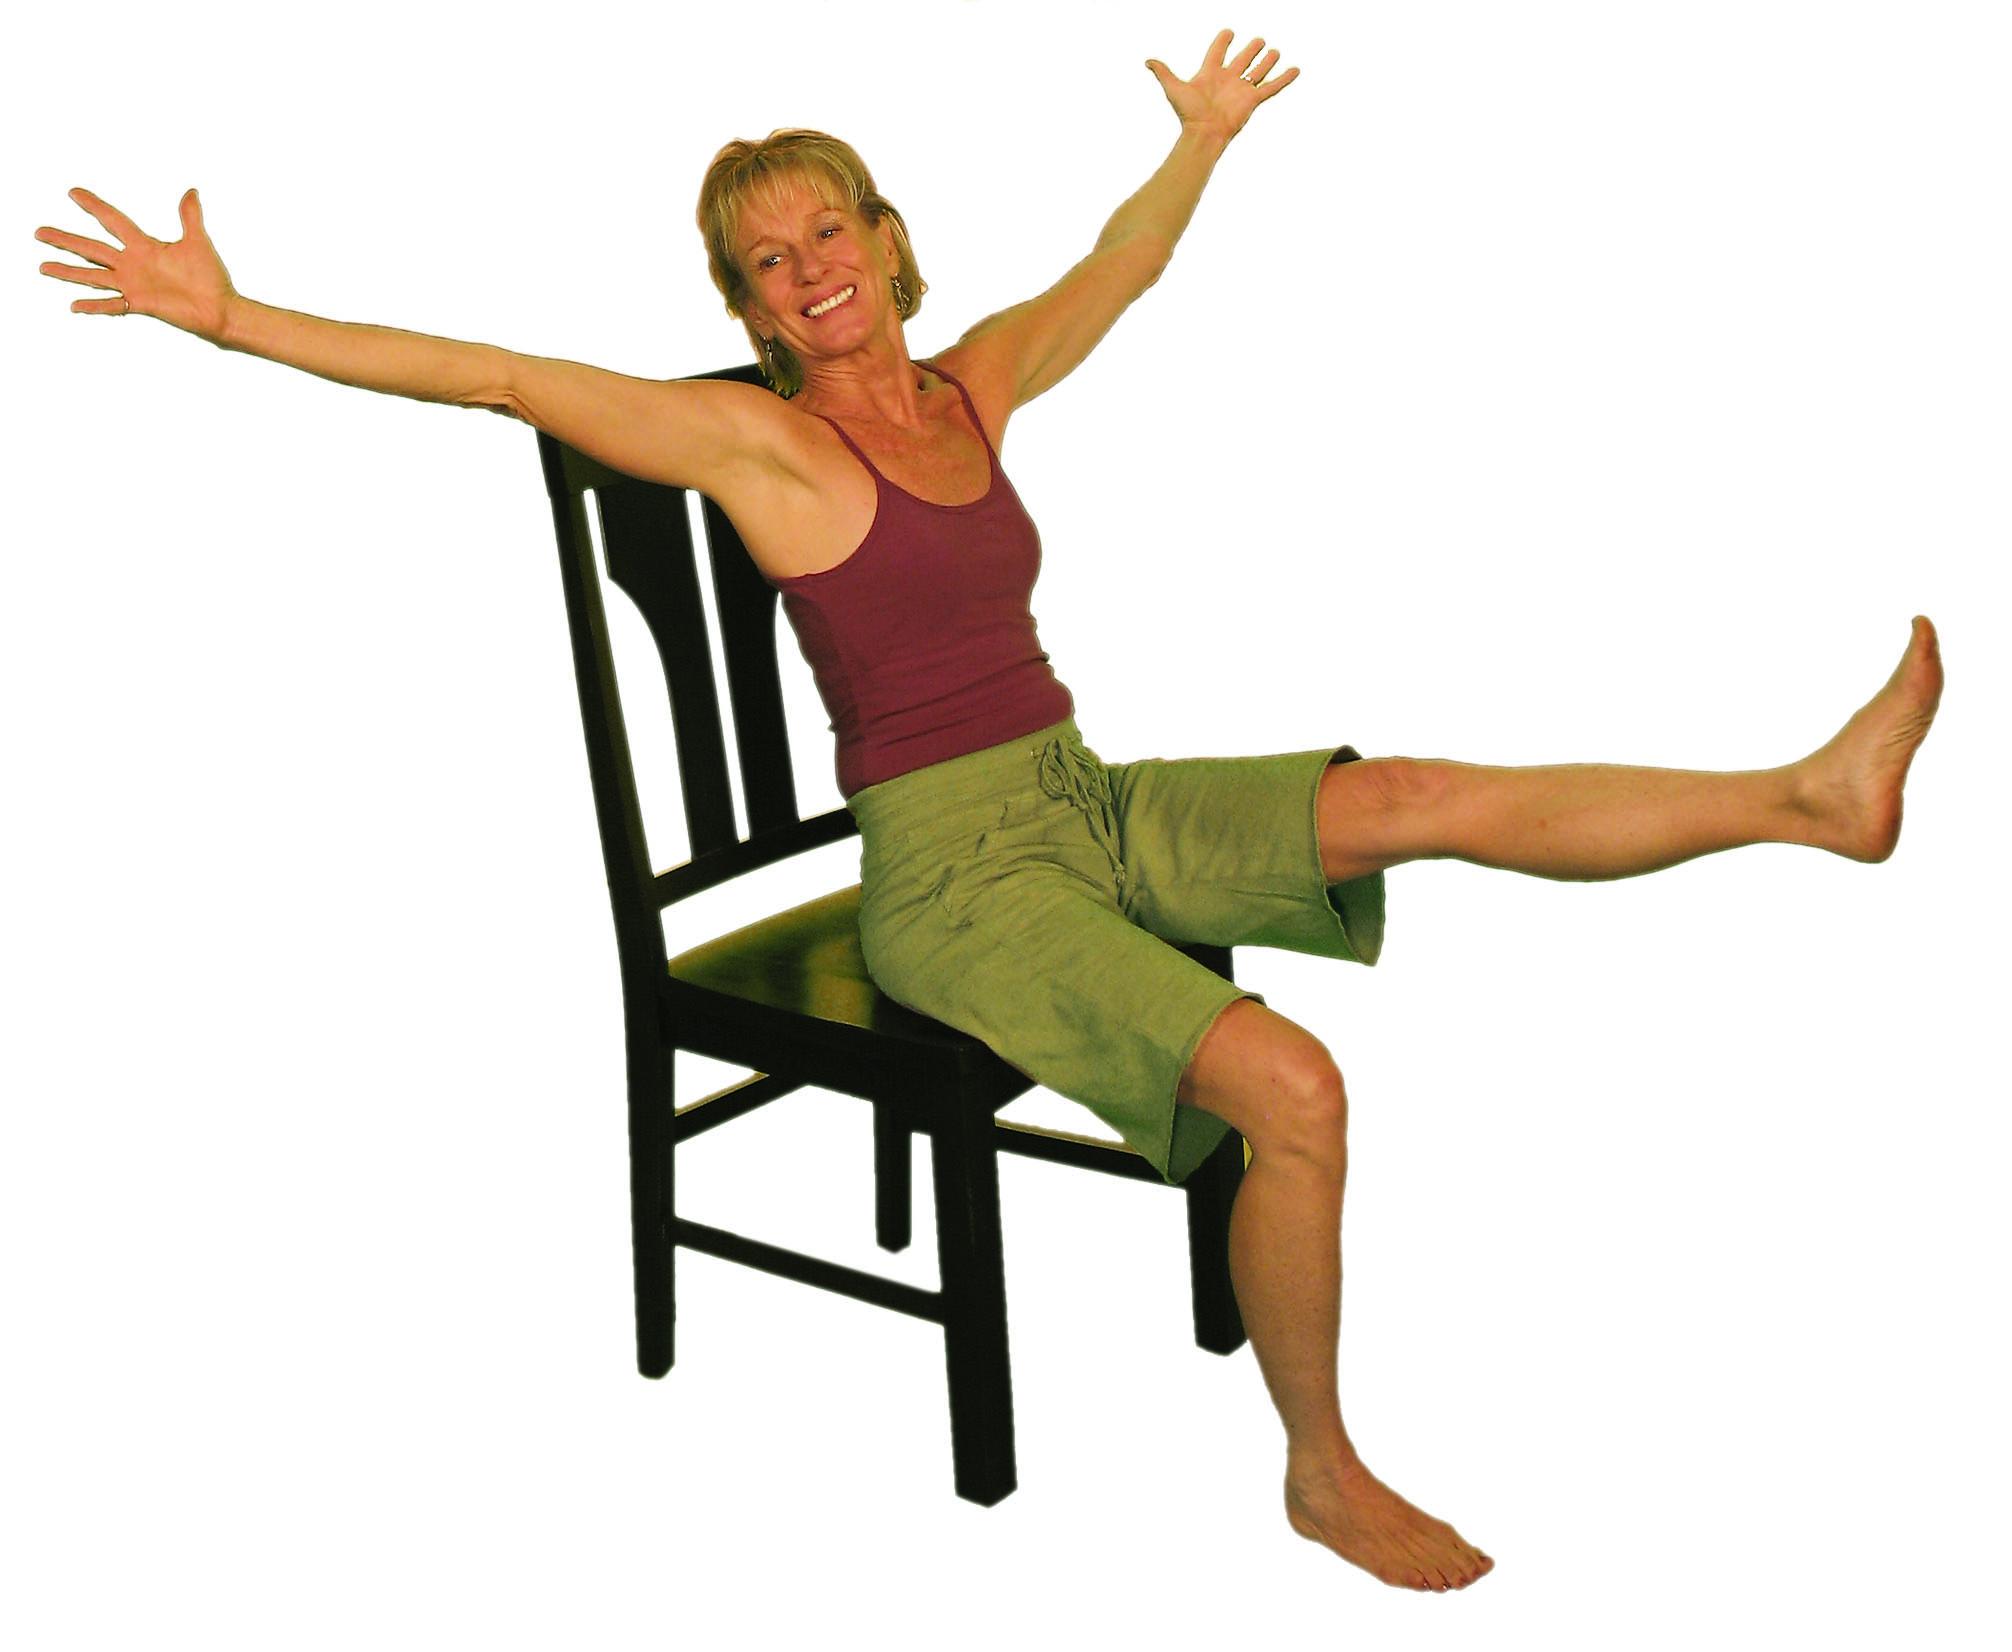 Lakshmi voelker chair yoga teacher lore kent starts for Chair yoga benefits